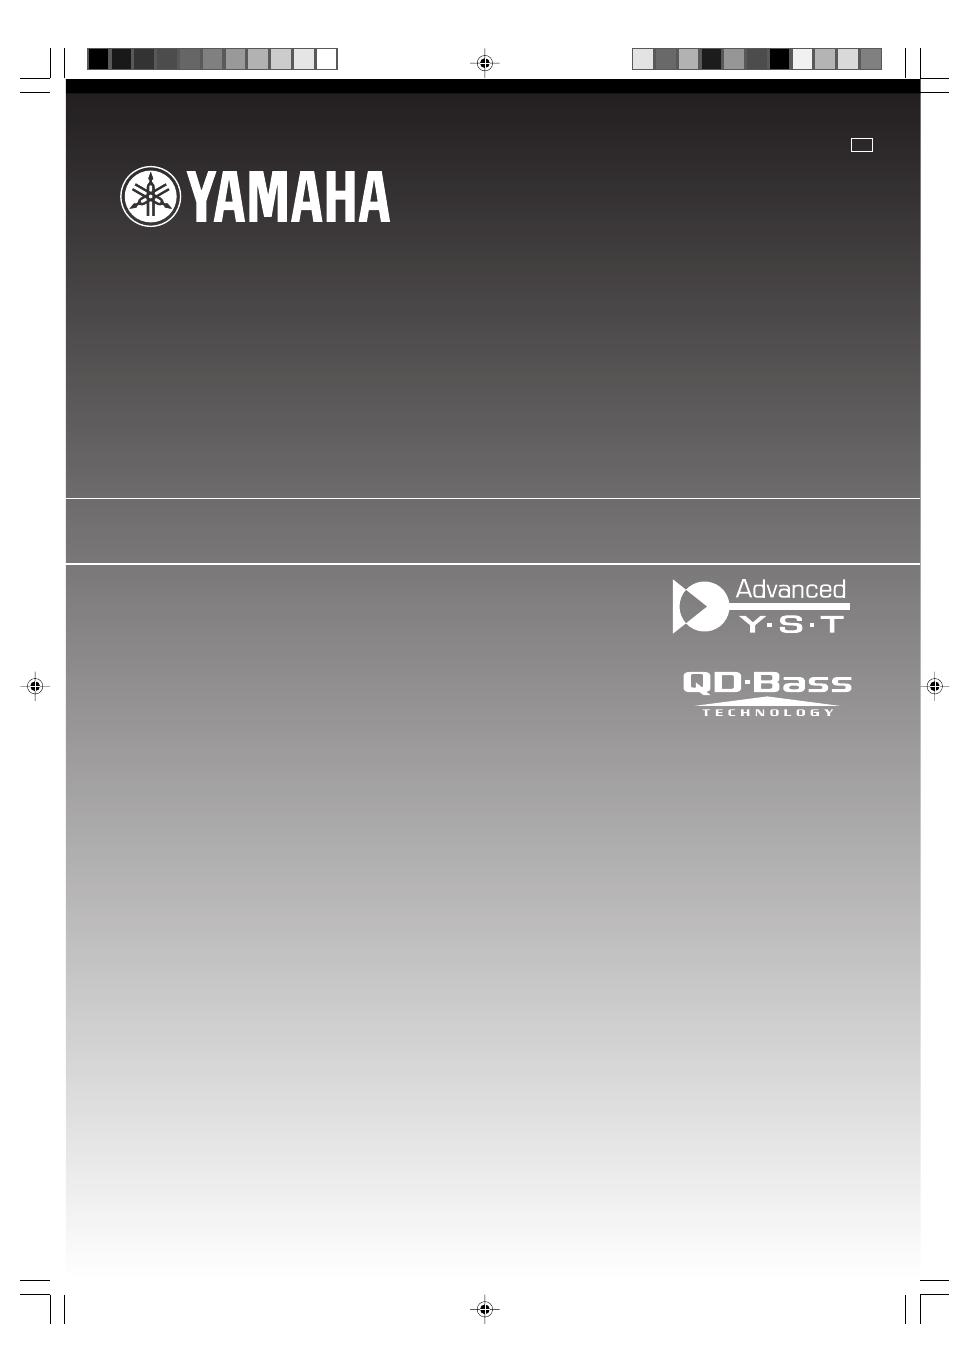 Yamaha NX-430P Owner's Manual - Free PDF Download (20 Pages)